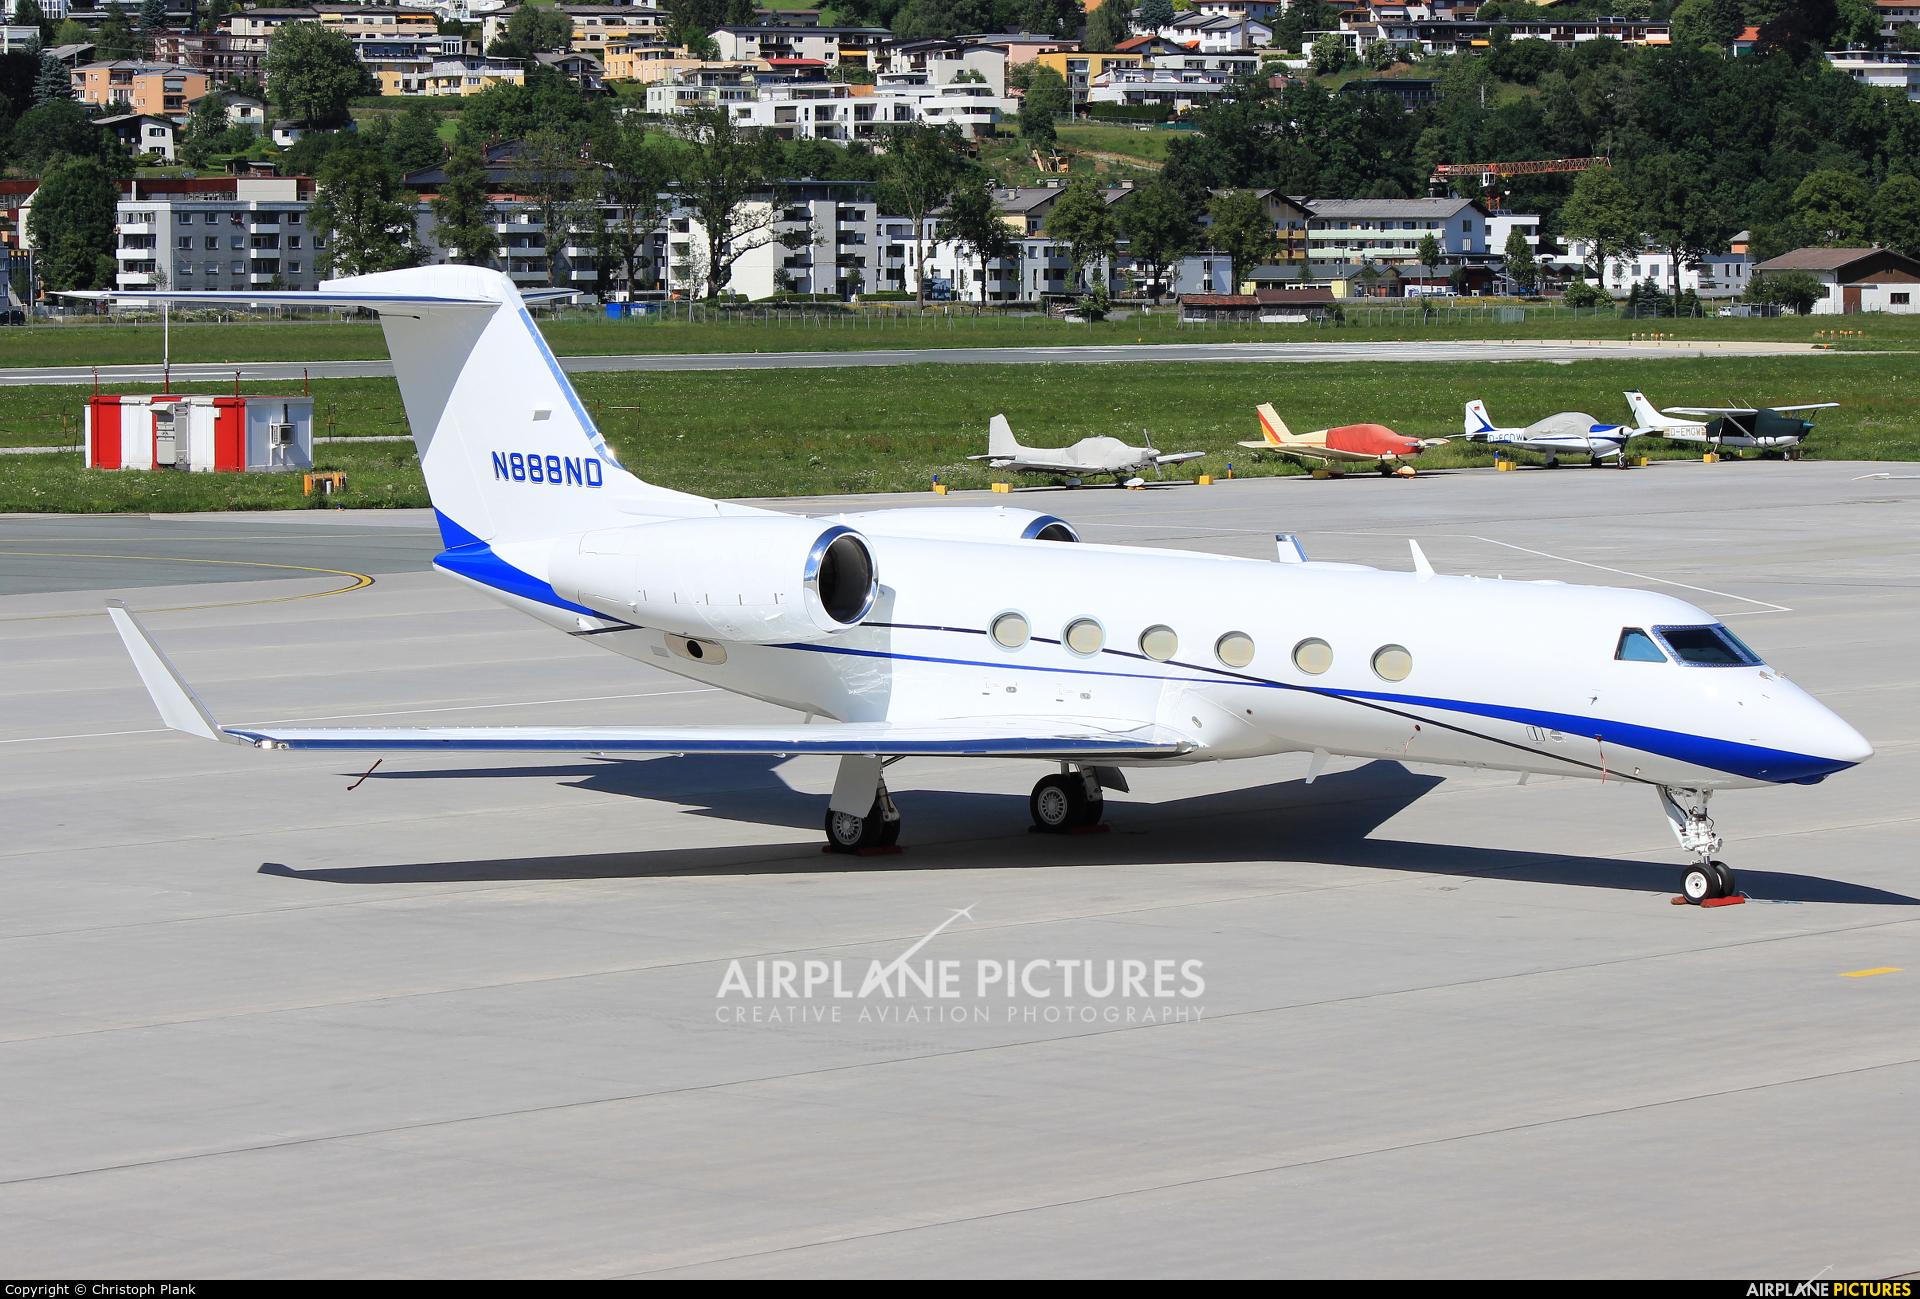 NPM Equipment Leasing LLC N888ND aircraft at Innsbruck